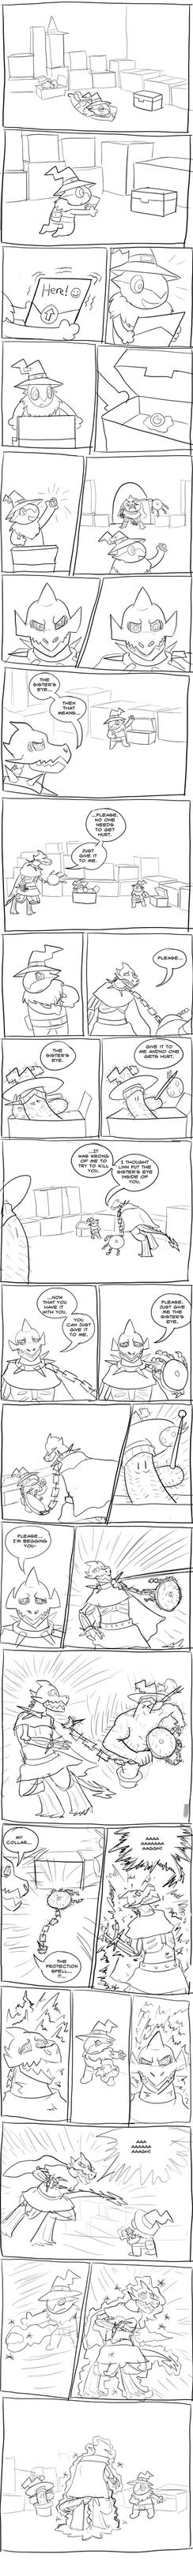 Wizard Palooza OCT: Round 3 Page 10 by PSIJoel